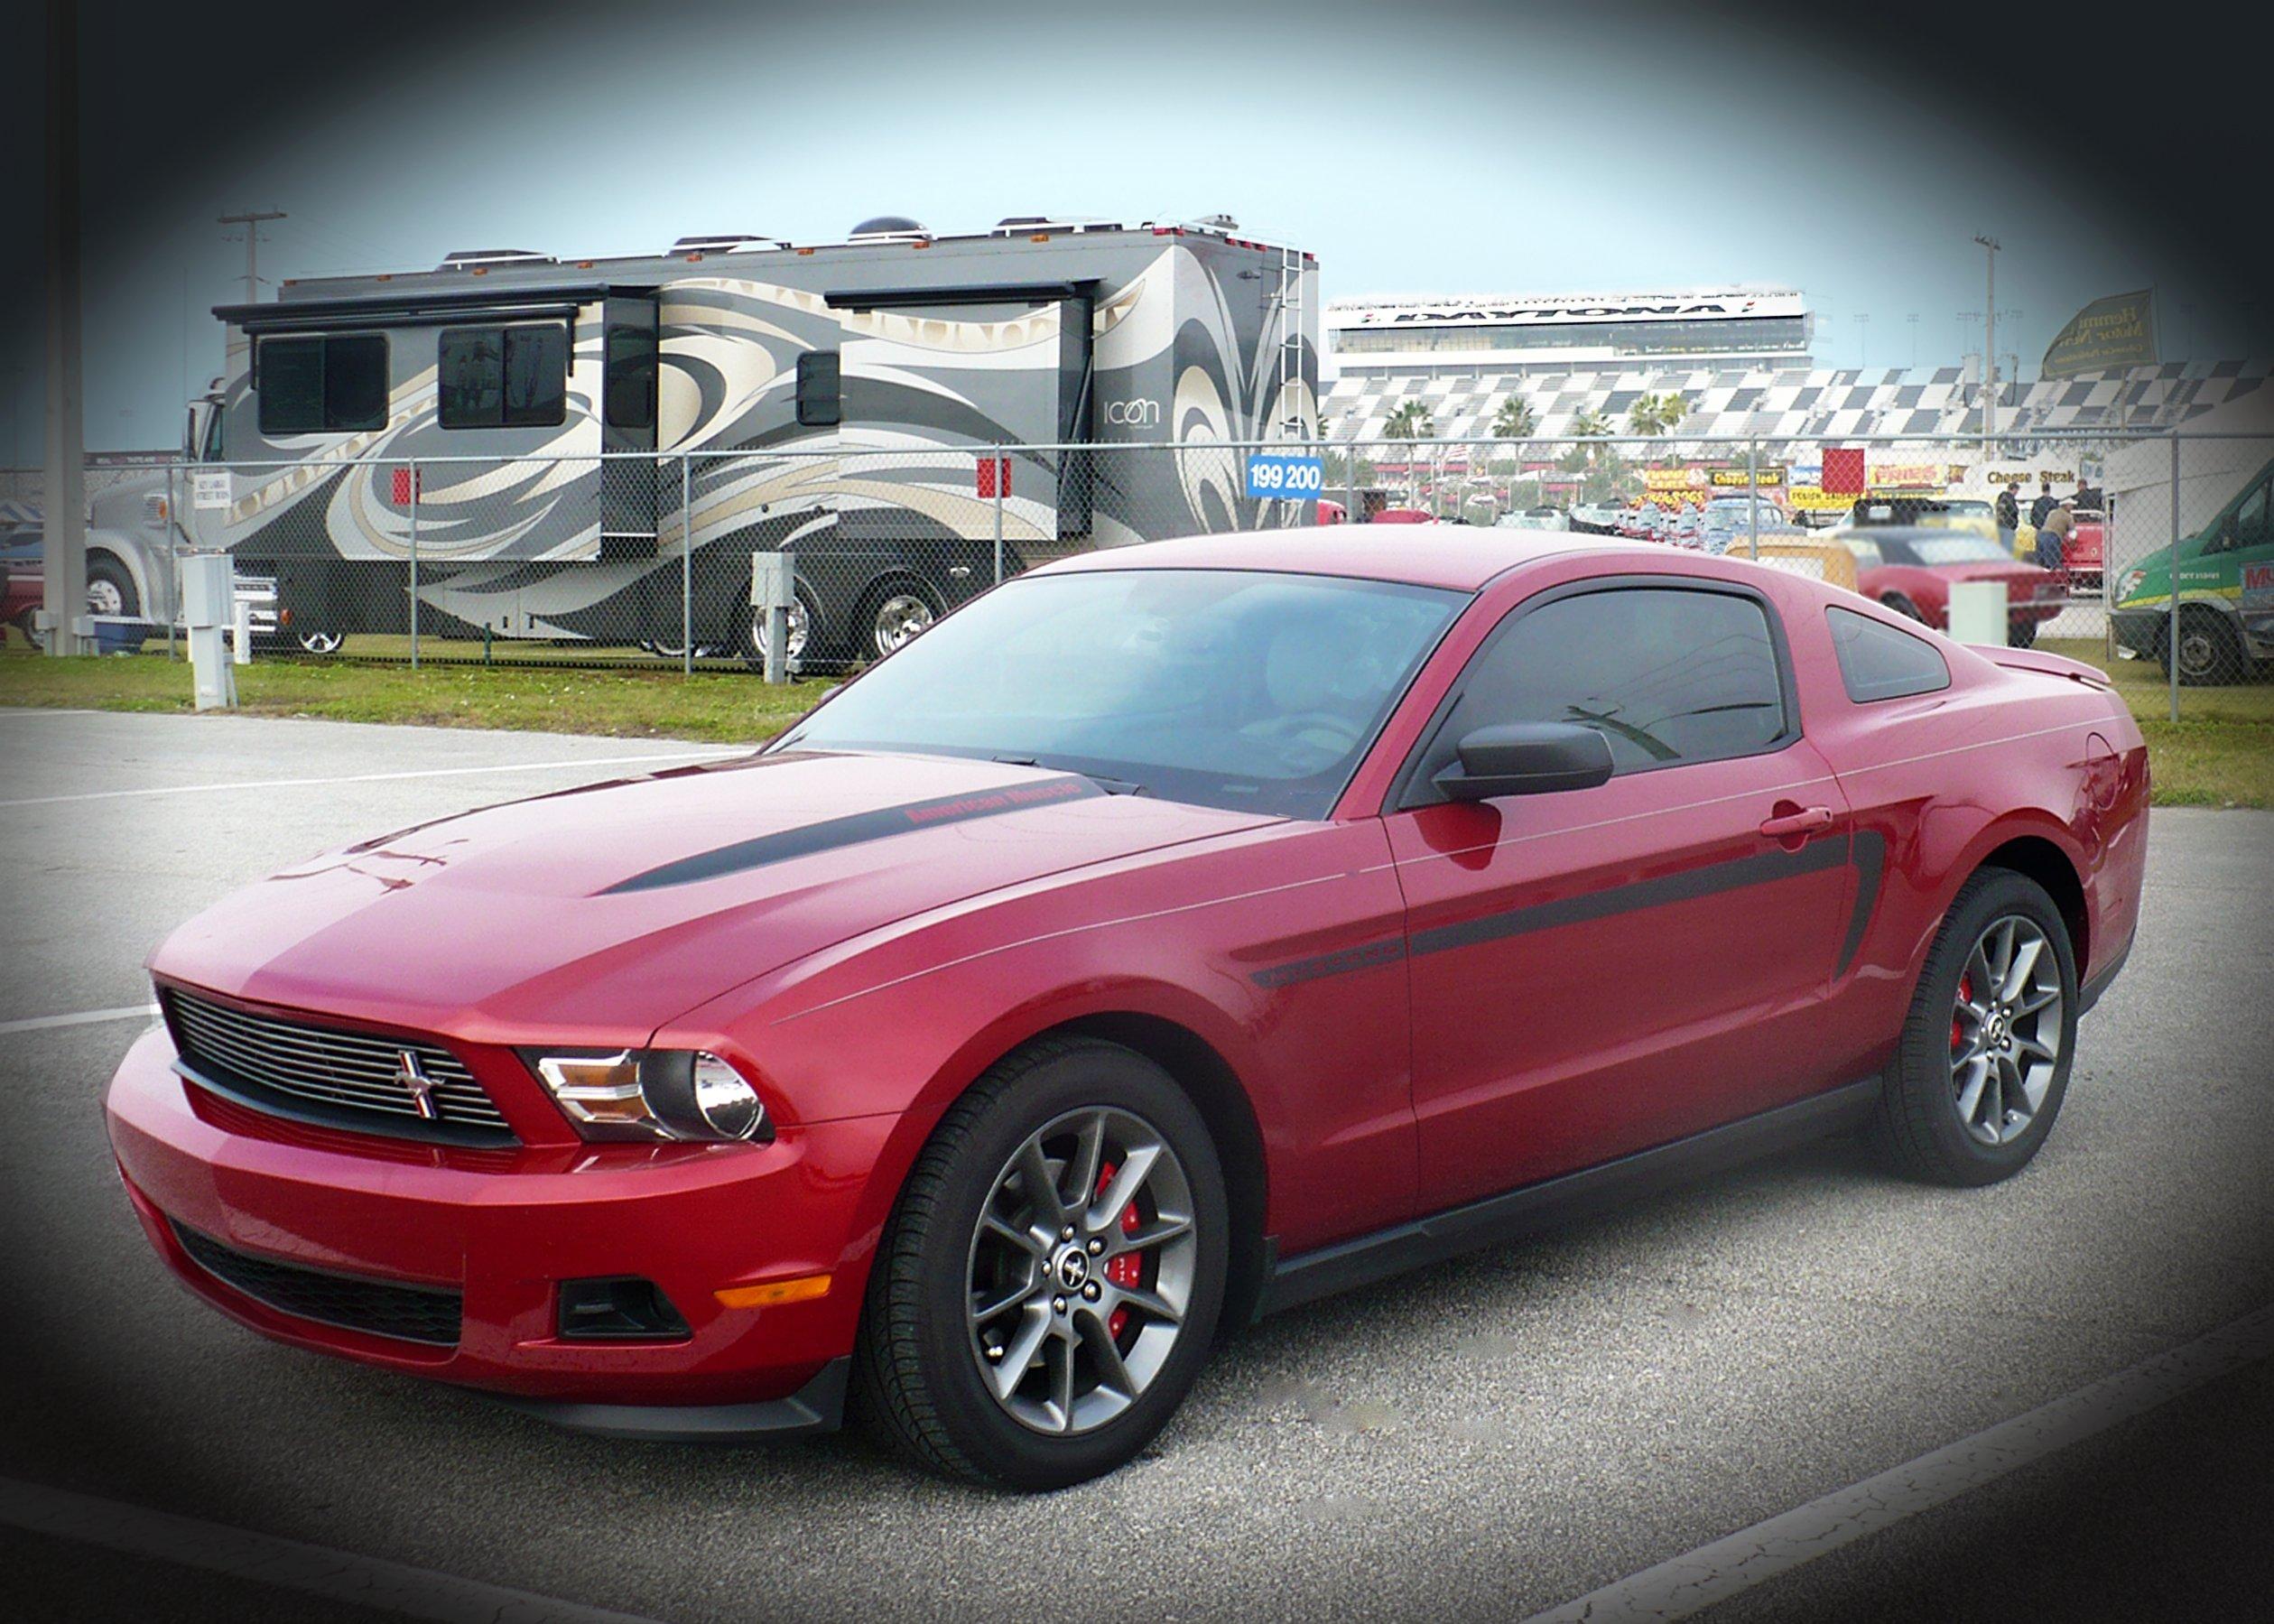 Click image for larger version  Name:Daytona Mustang.jpg Views:117 Size:641.3 KB ID:201815